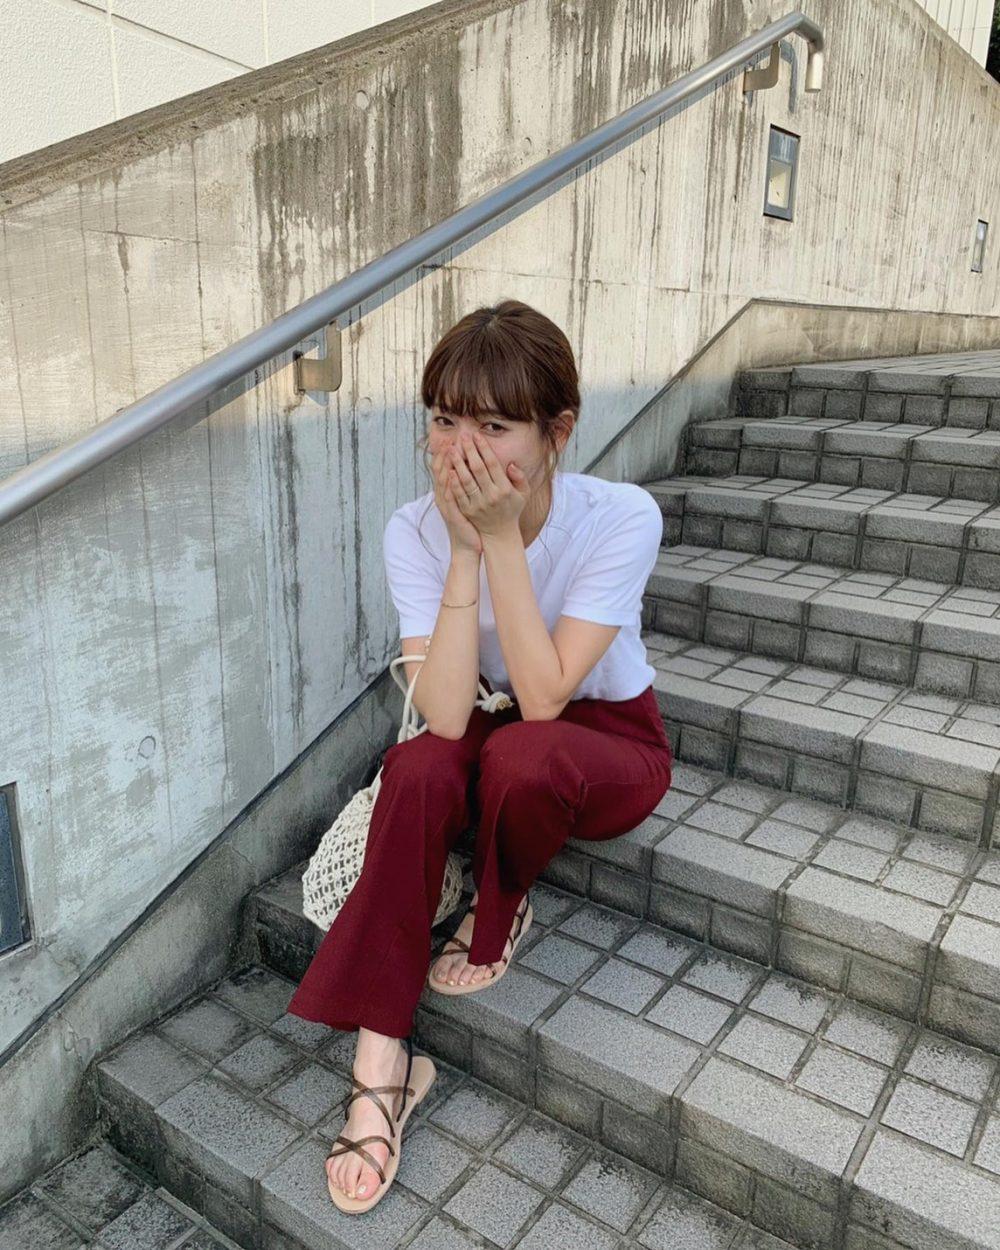 GU ジーユー セミフレアパンツ 新作 コーデ CanCam it girl 前坂美結